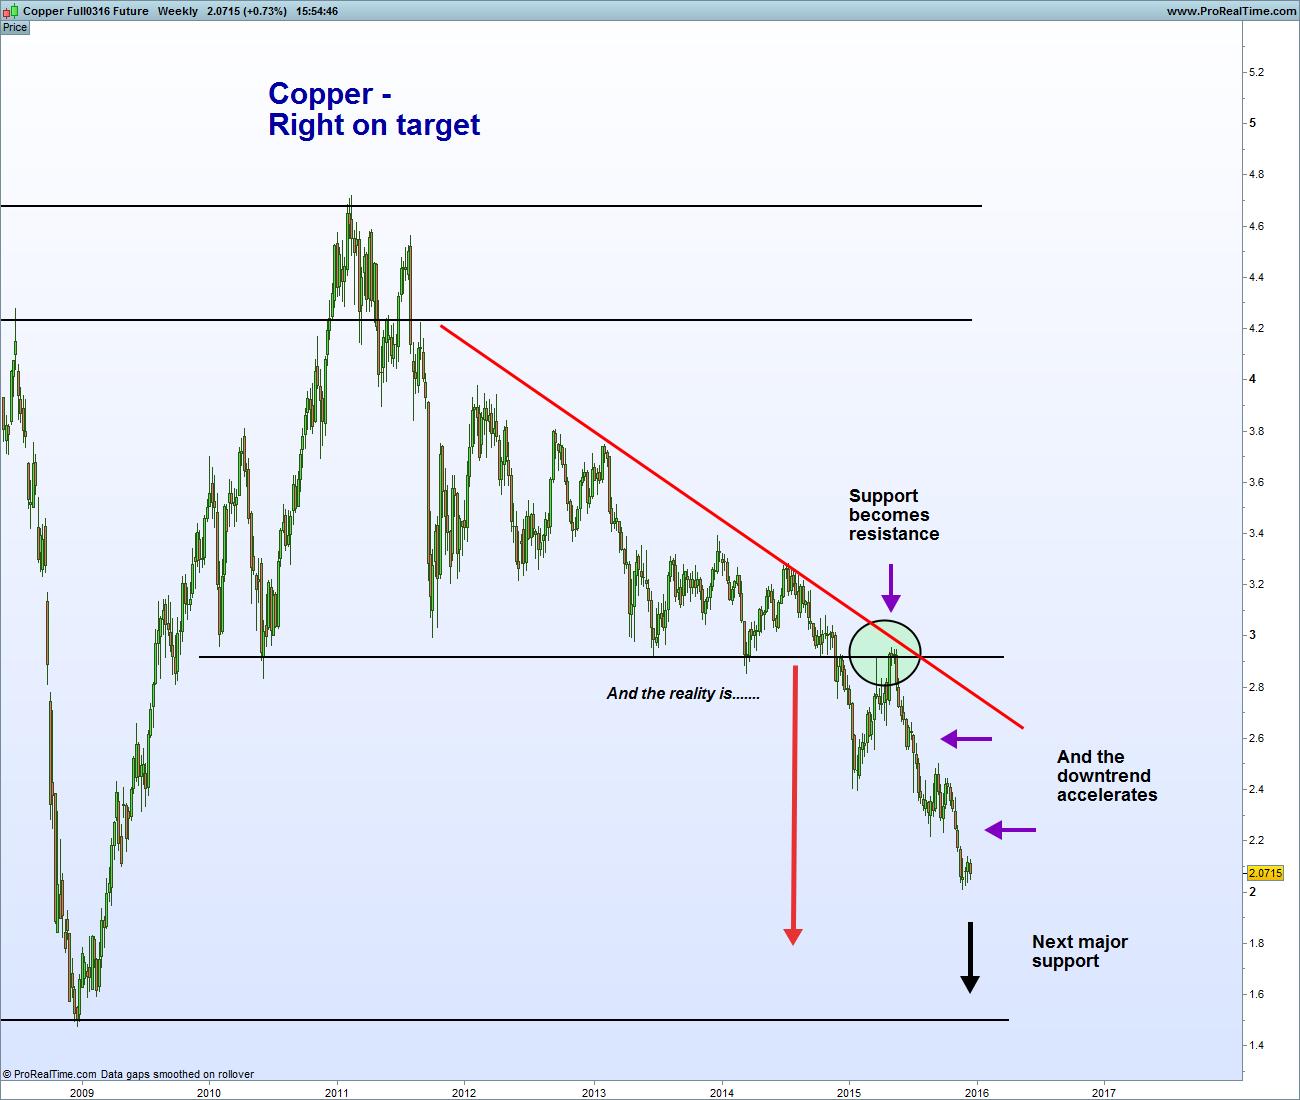 Copper Full0316 Future